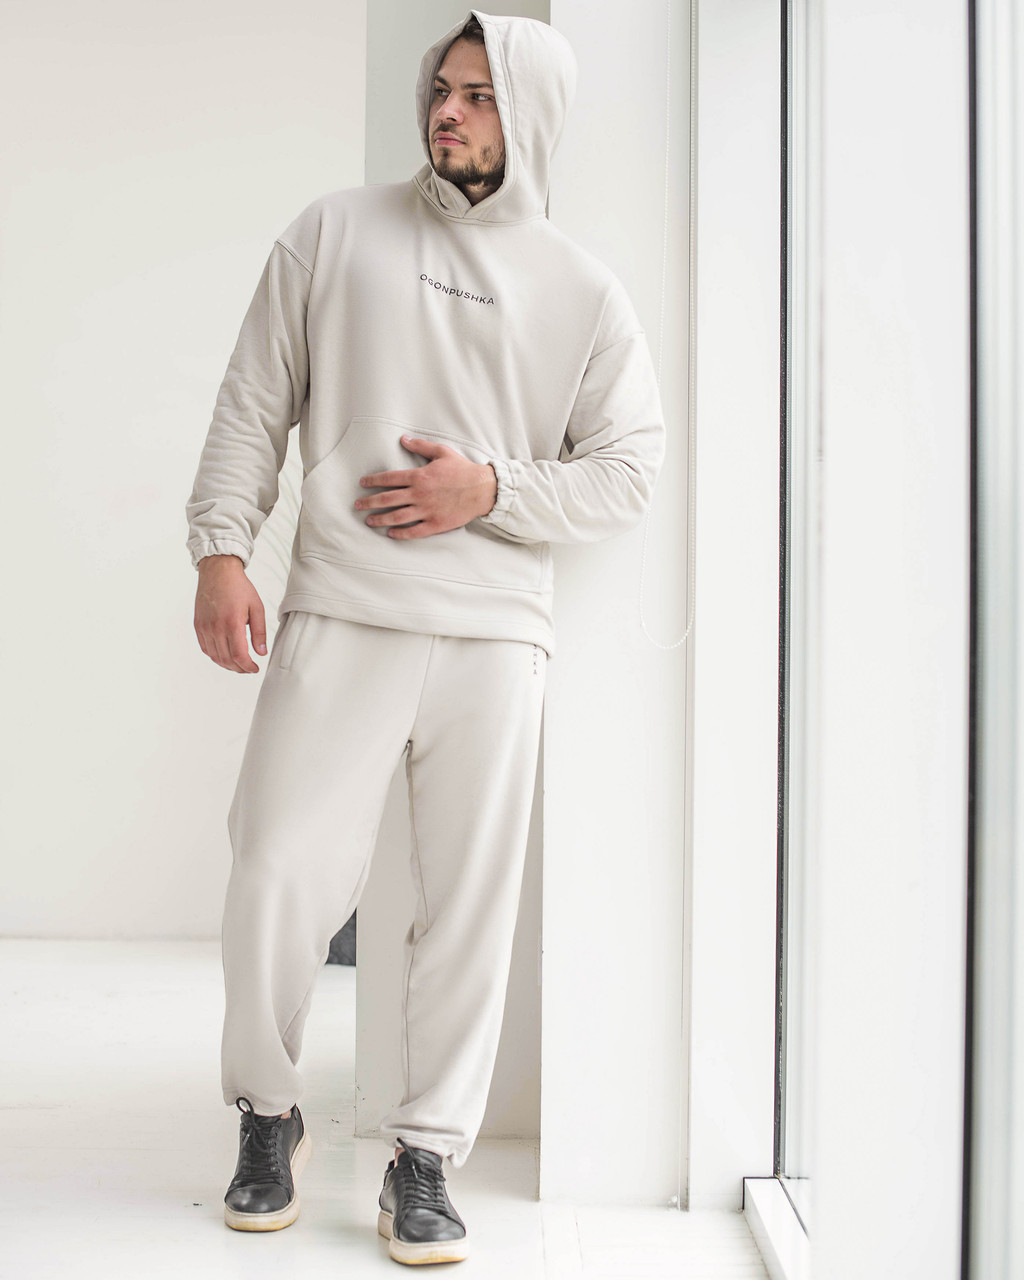 Спортивный костюм оверсайз Пушка Огонь Scale 2.0 бежево-серый